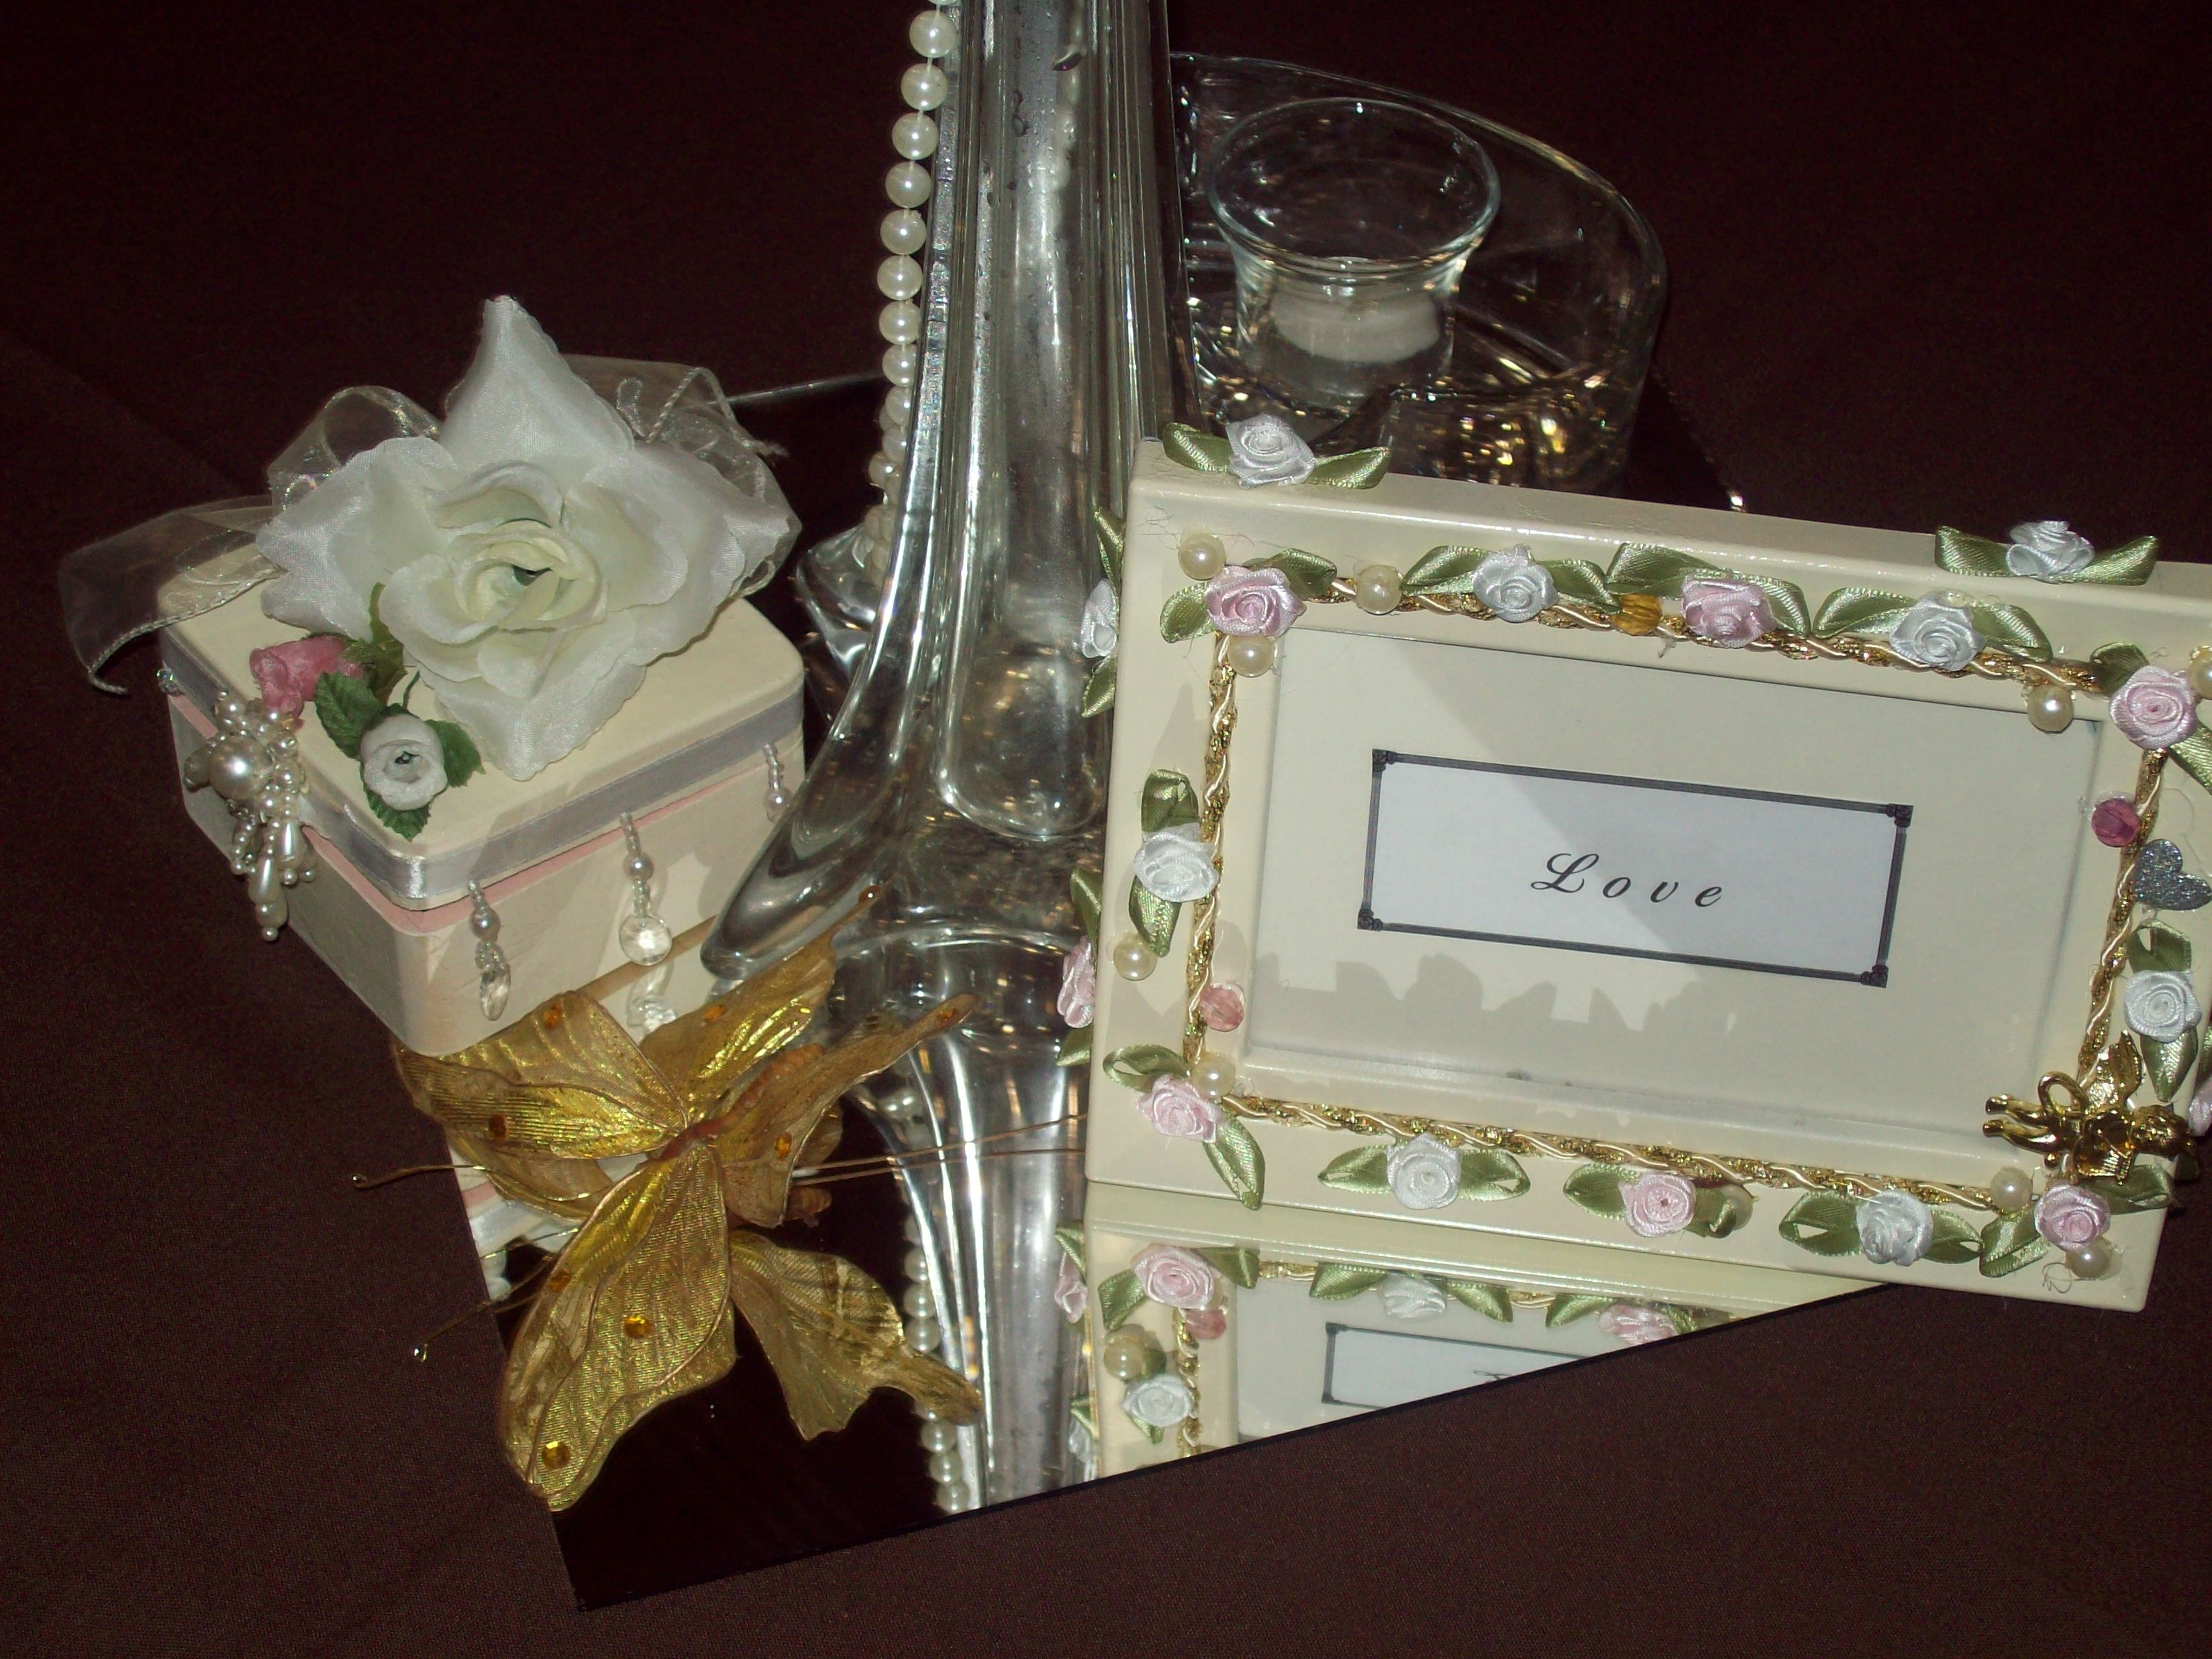 Wedding centerpieceby carmenus creations carmenus creations